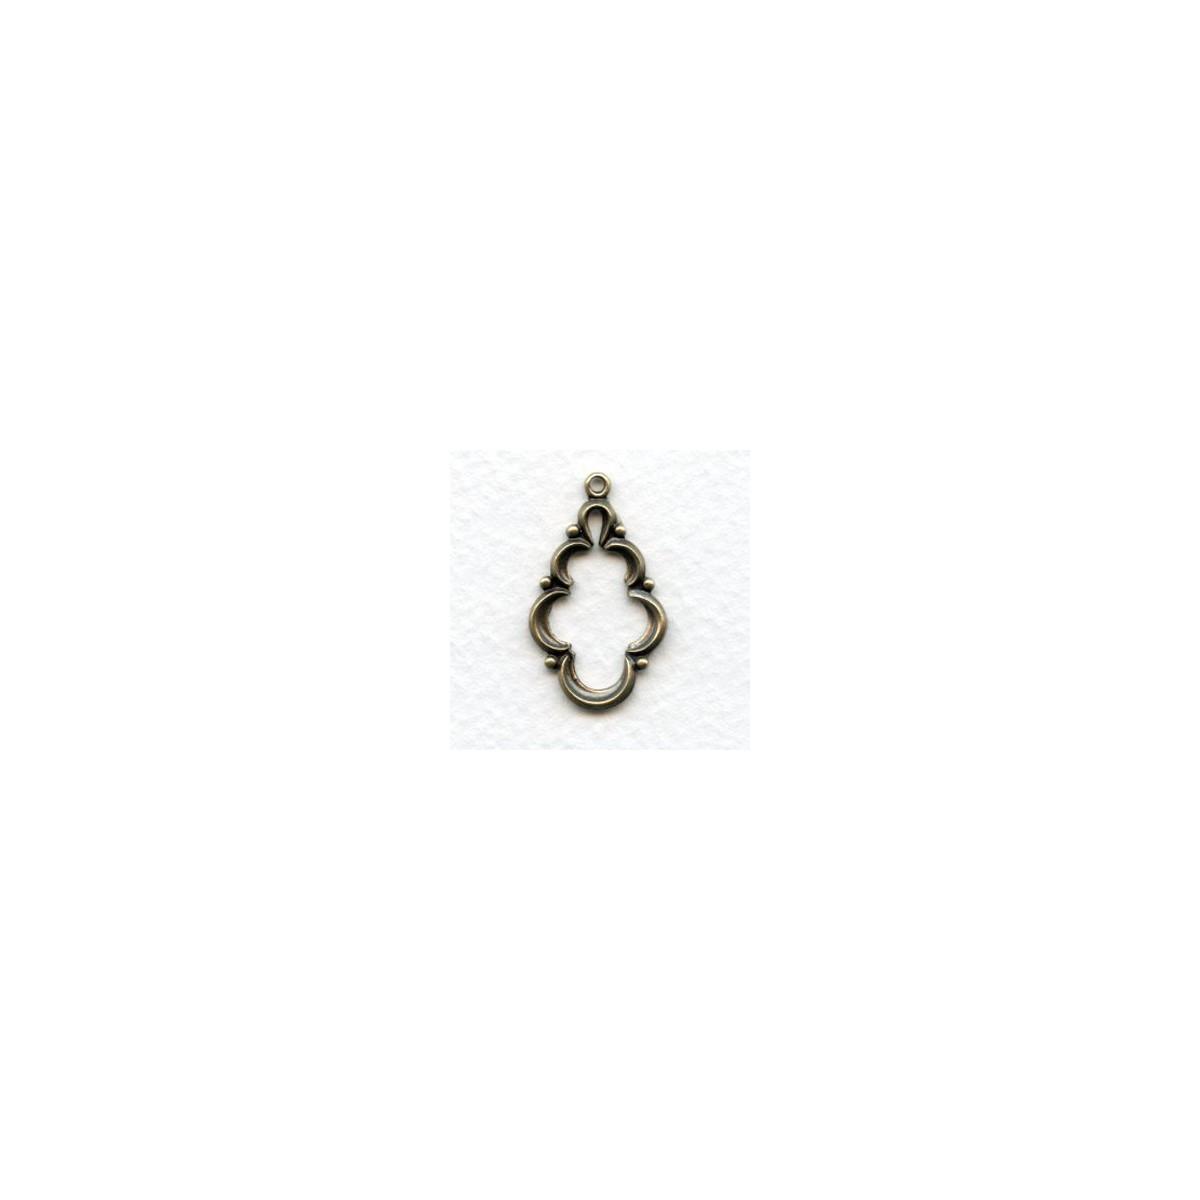 Endless Possibilities! Open Center Pendant Oxidized Brass